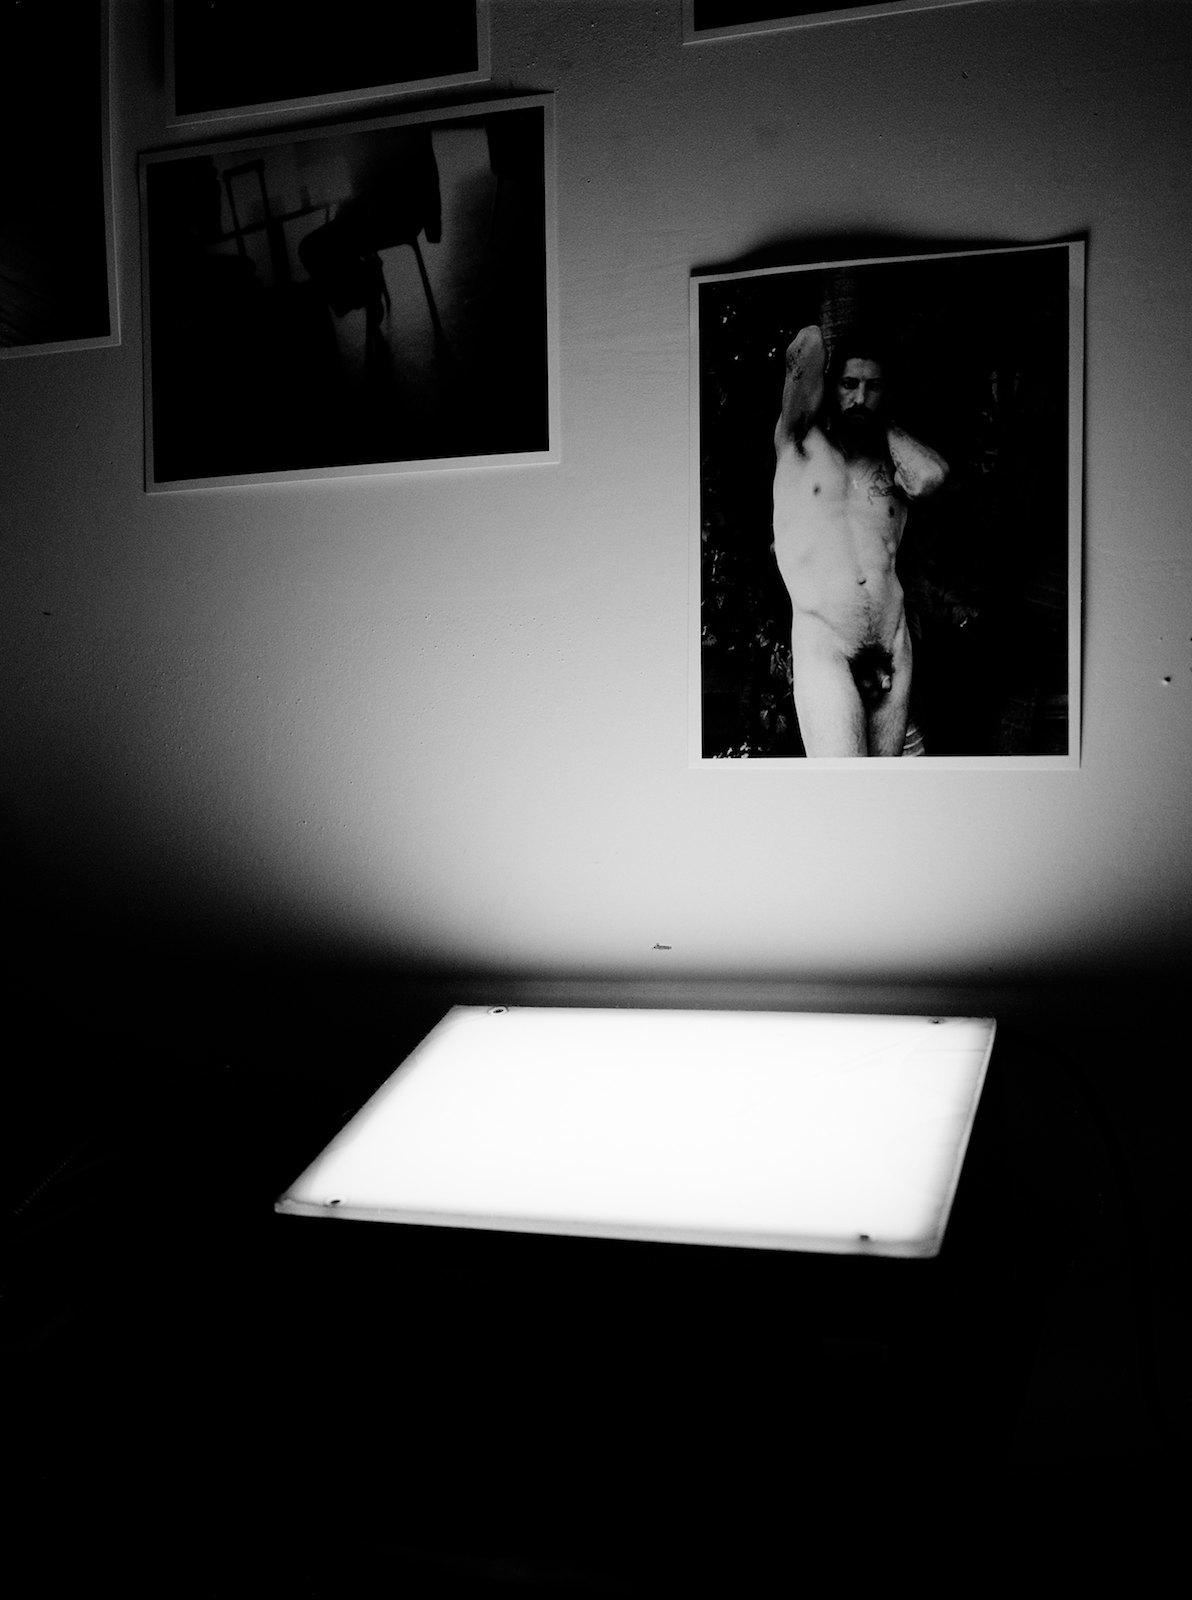 Sudio muse, 2014, giclée print, 149 x 111 cm, ed. 5